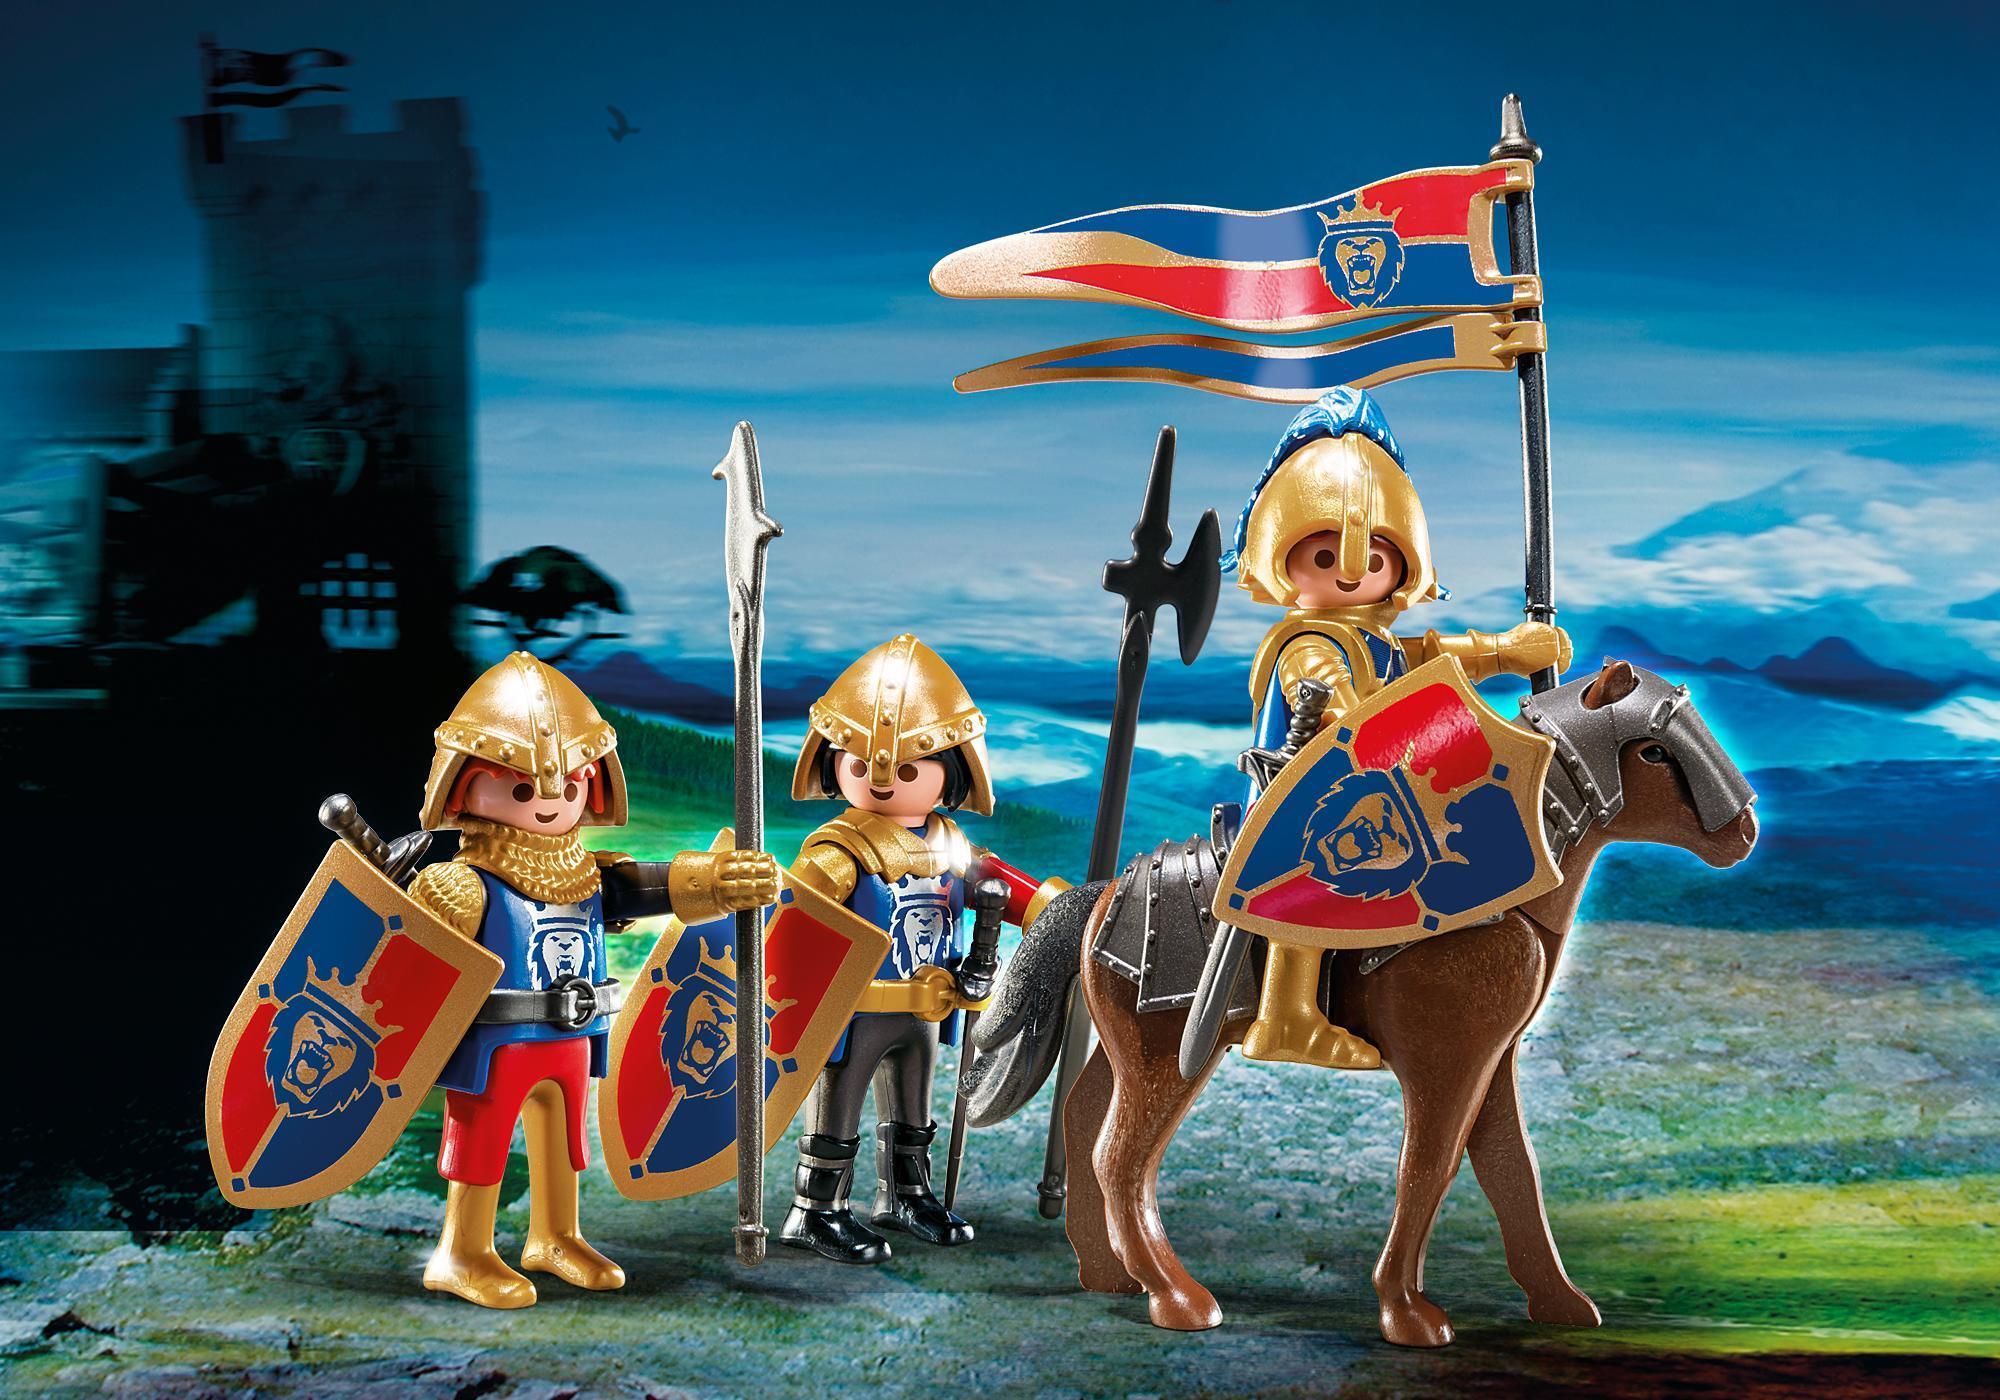 http://media.playmobil.com/i/playmobil/6006_product_detail/Рыцари: Разведывательный патруль Рыцарей Льва